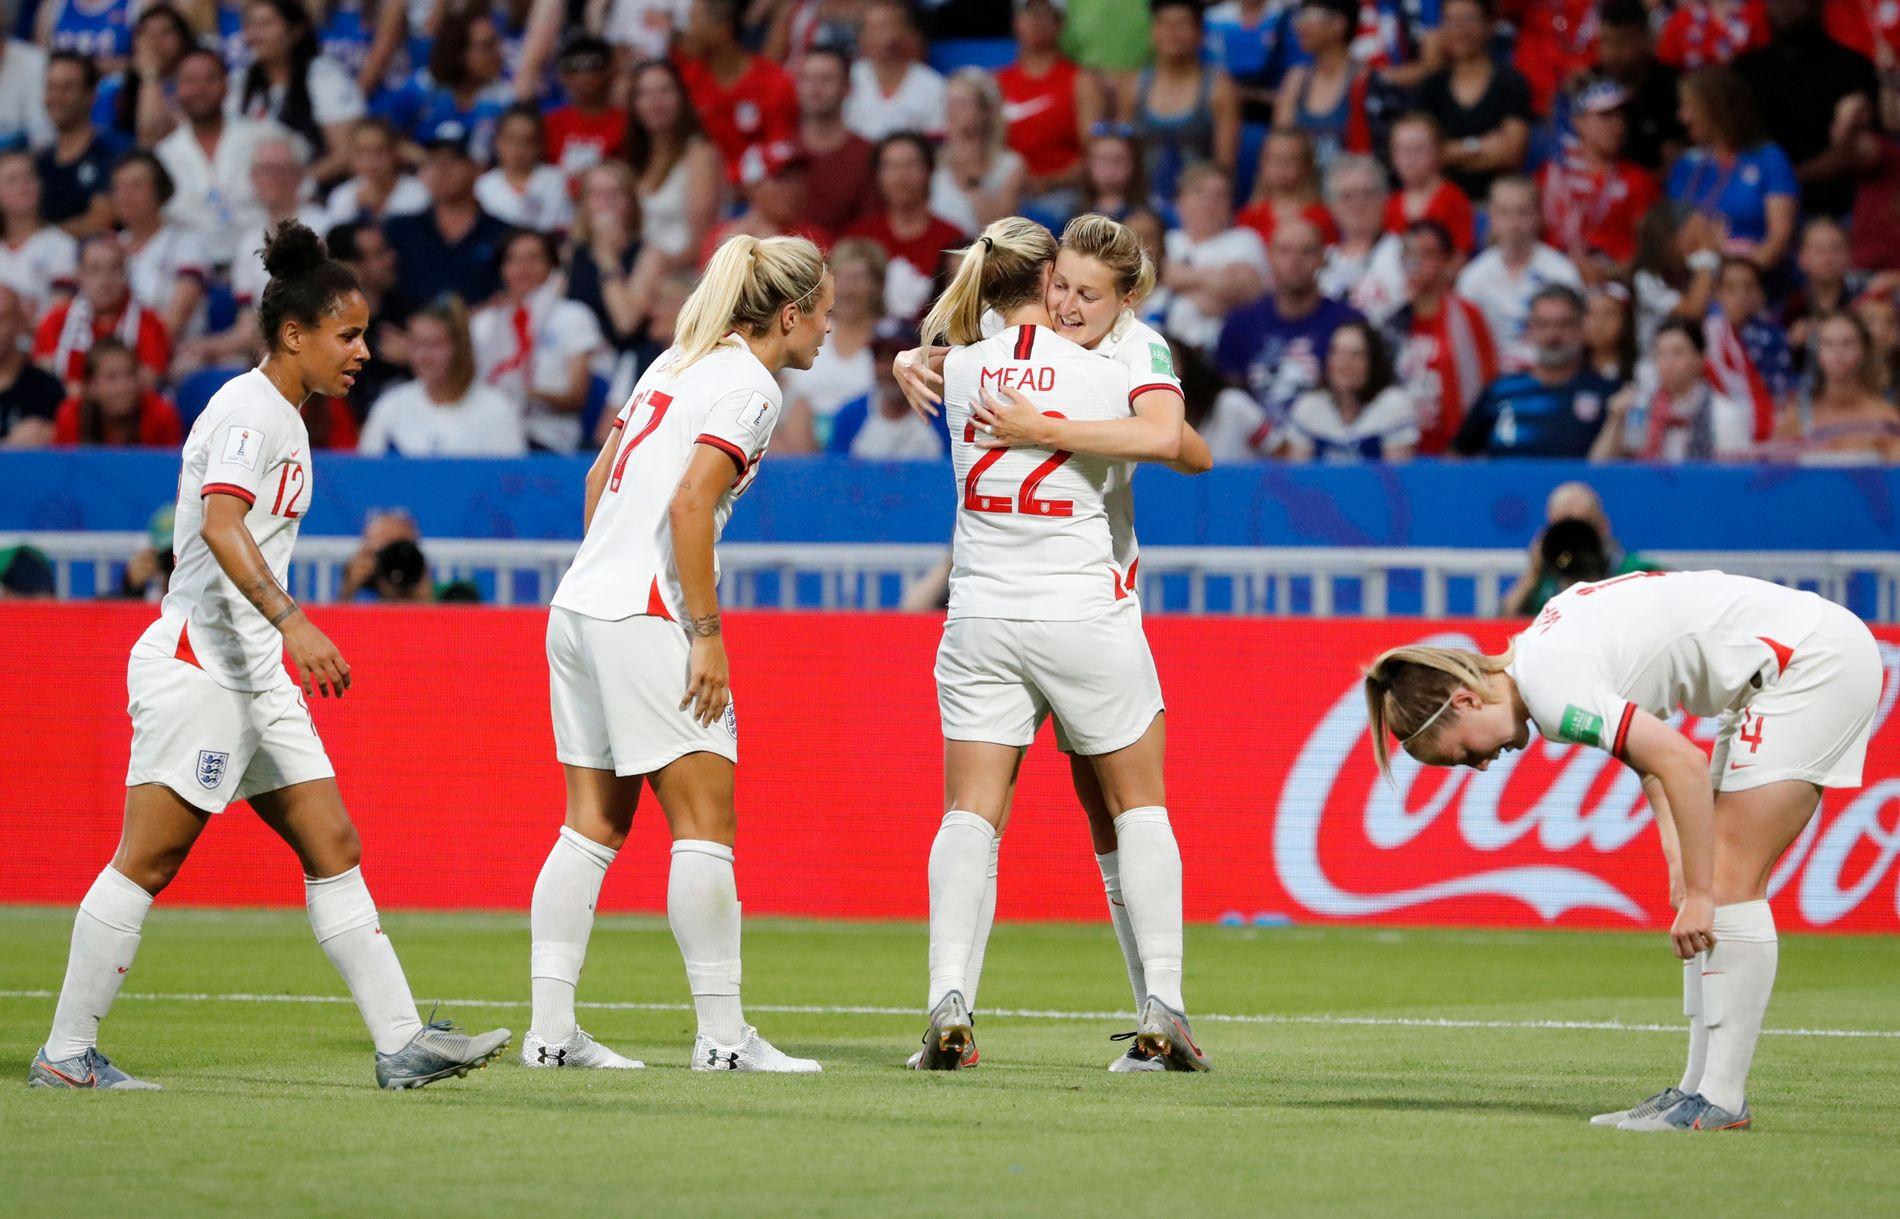 Ellen White scoret Englands mål.